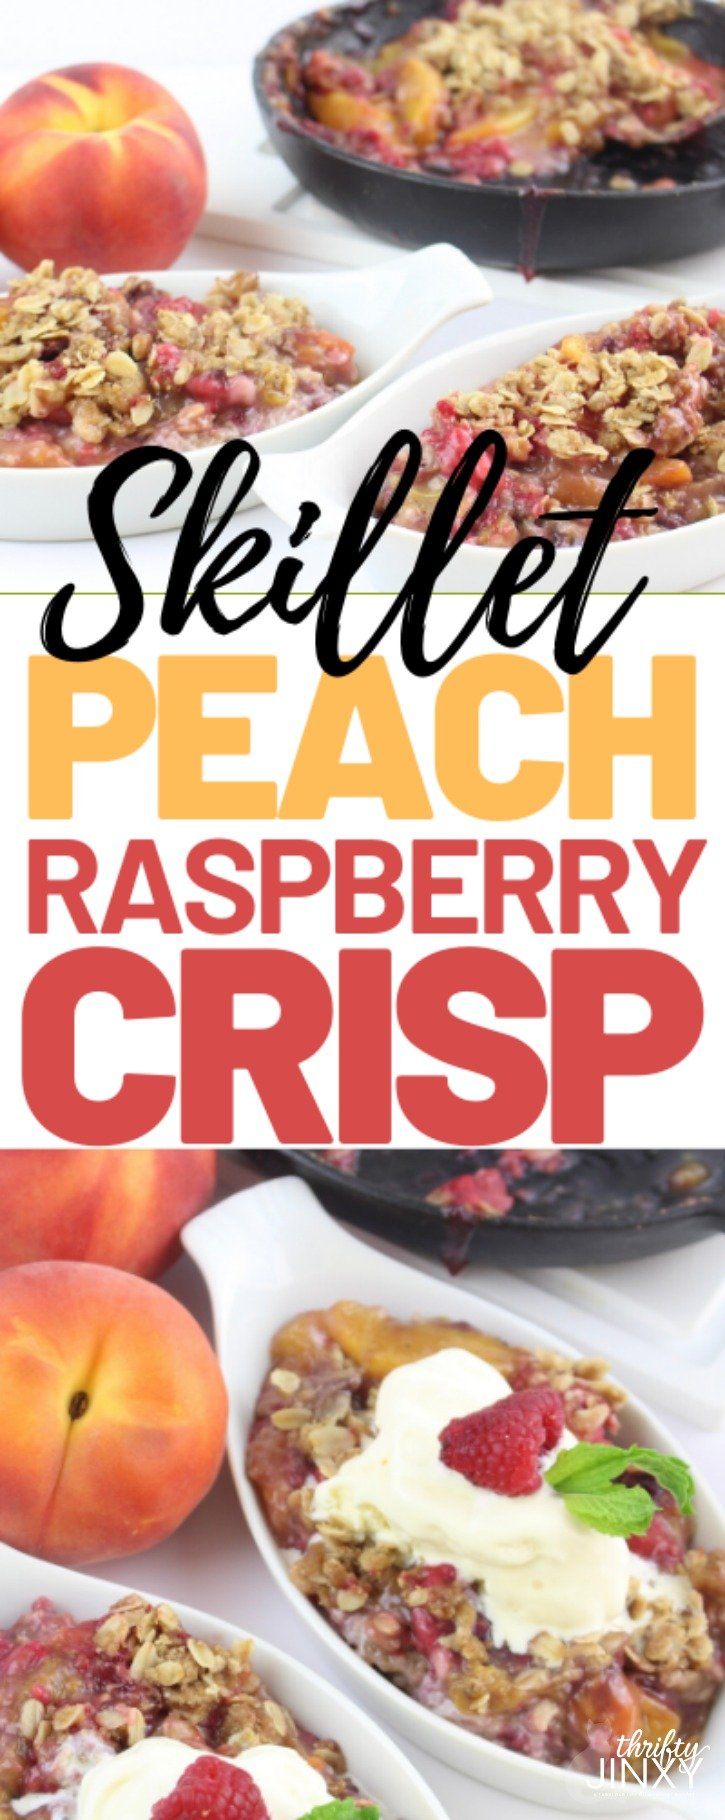 Skillet Peach Raspberry Crisp Recipe